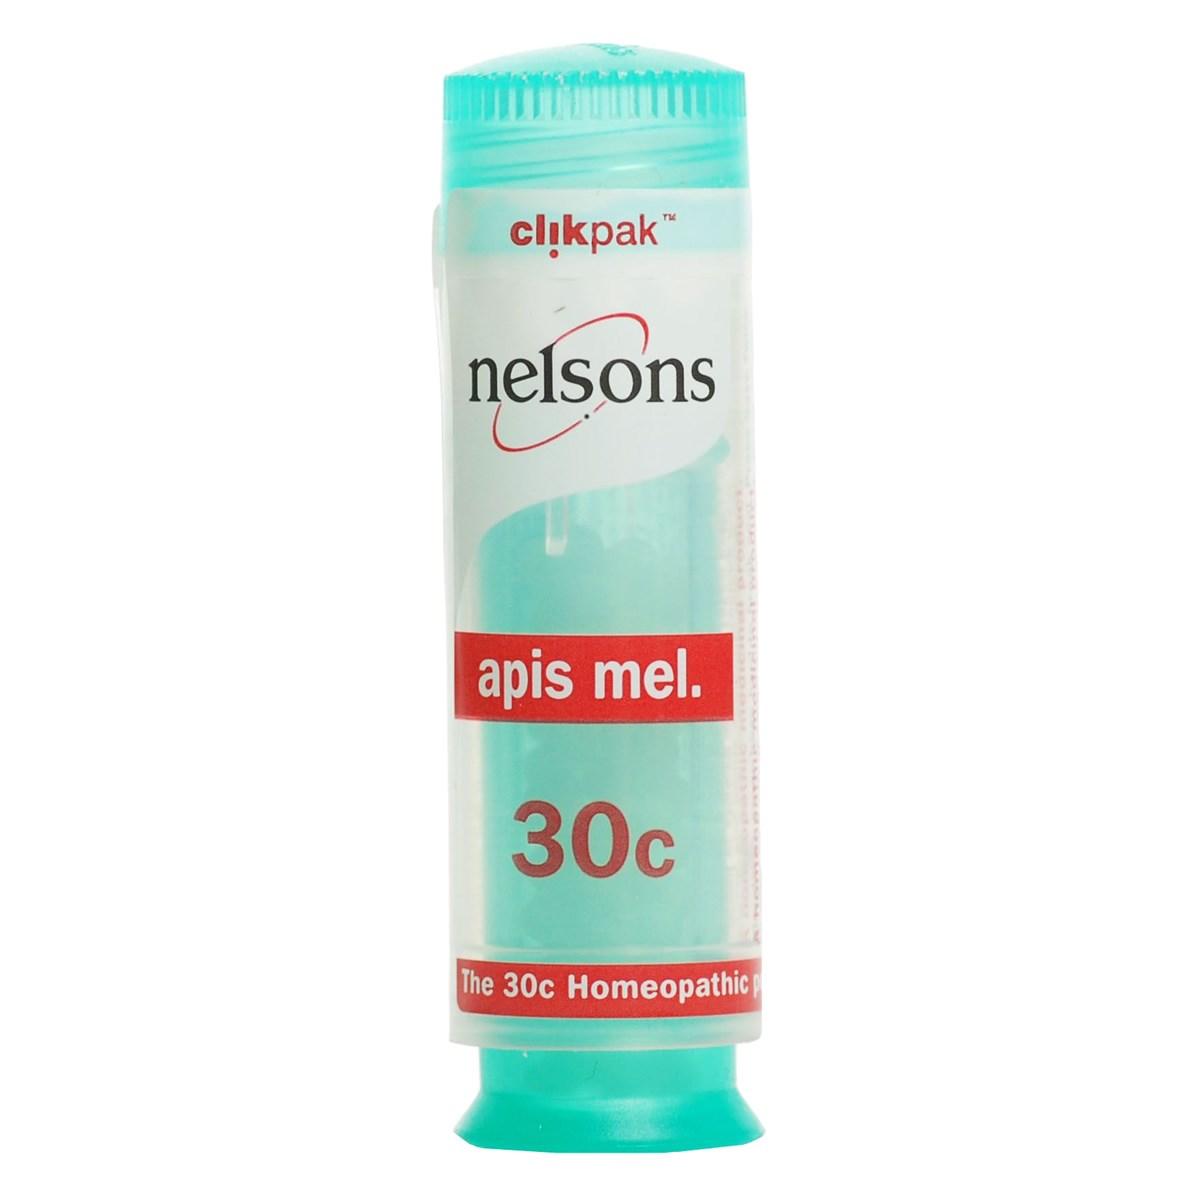 Nelsons Apis Mel Clikpak Tablets